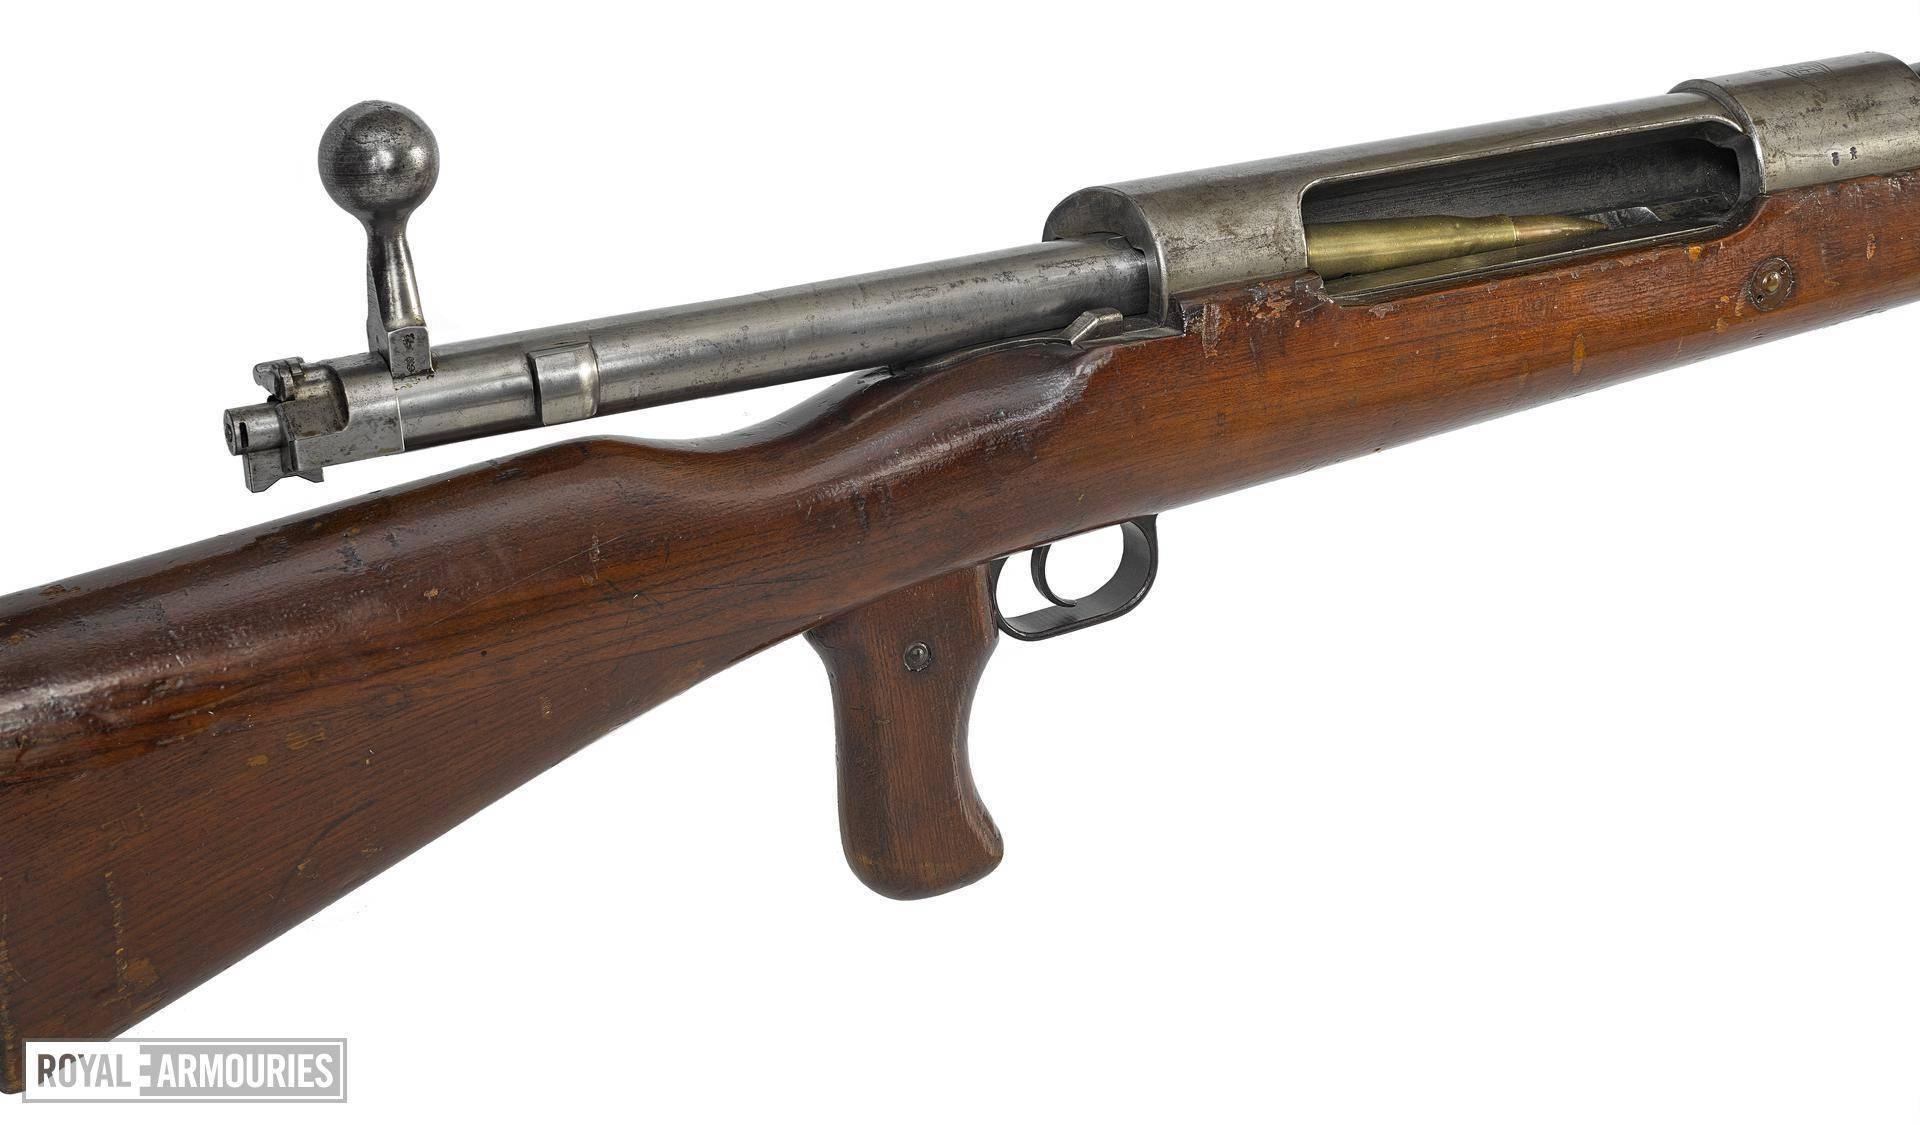 Mauser — википедия с видео // wiki 2